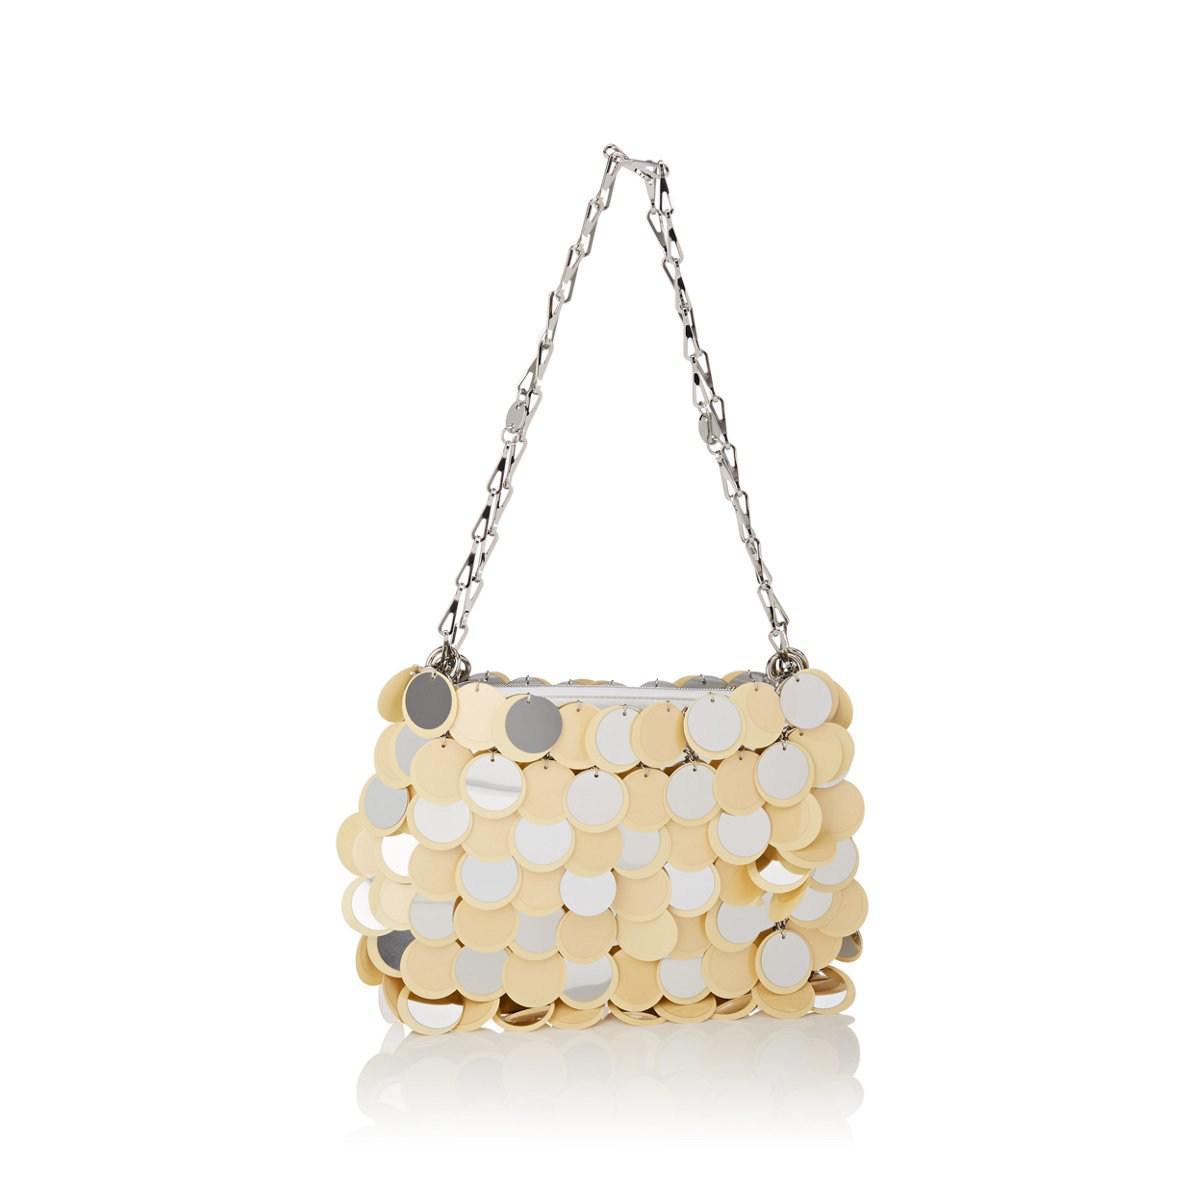 1c860c82f11f Lyst - Paco Rabanne Iconic Sparkle Shoulder Bag in Metallic